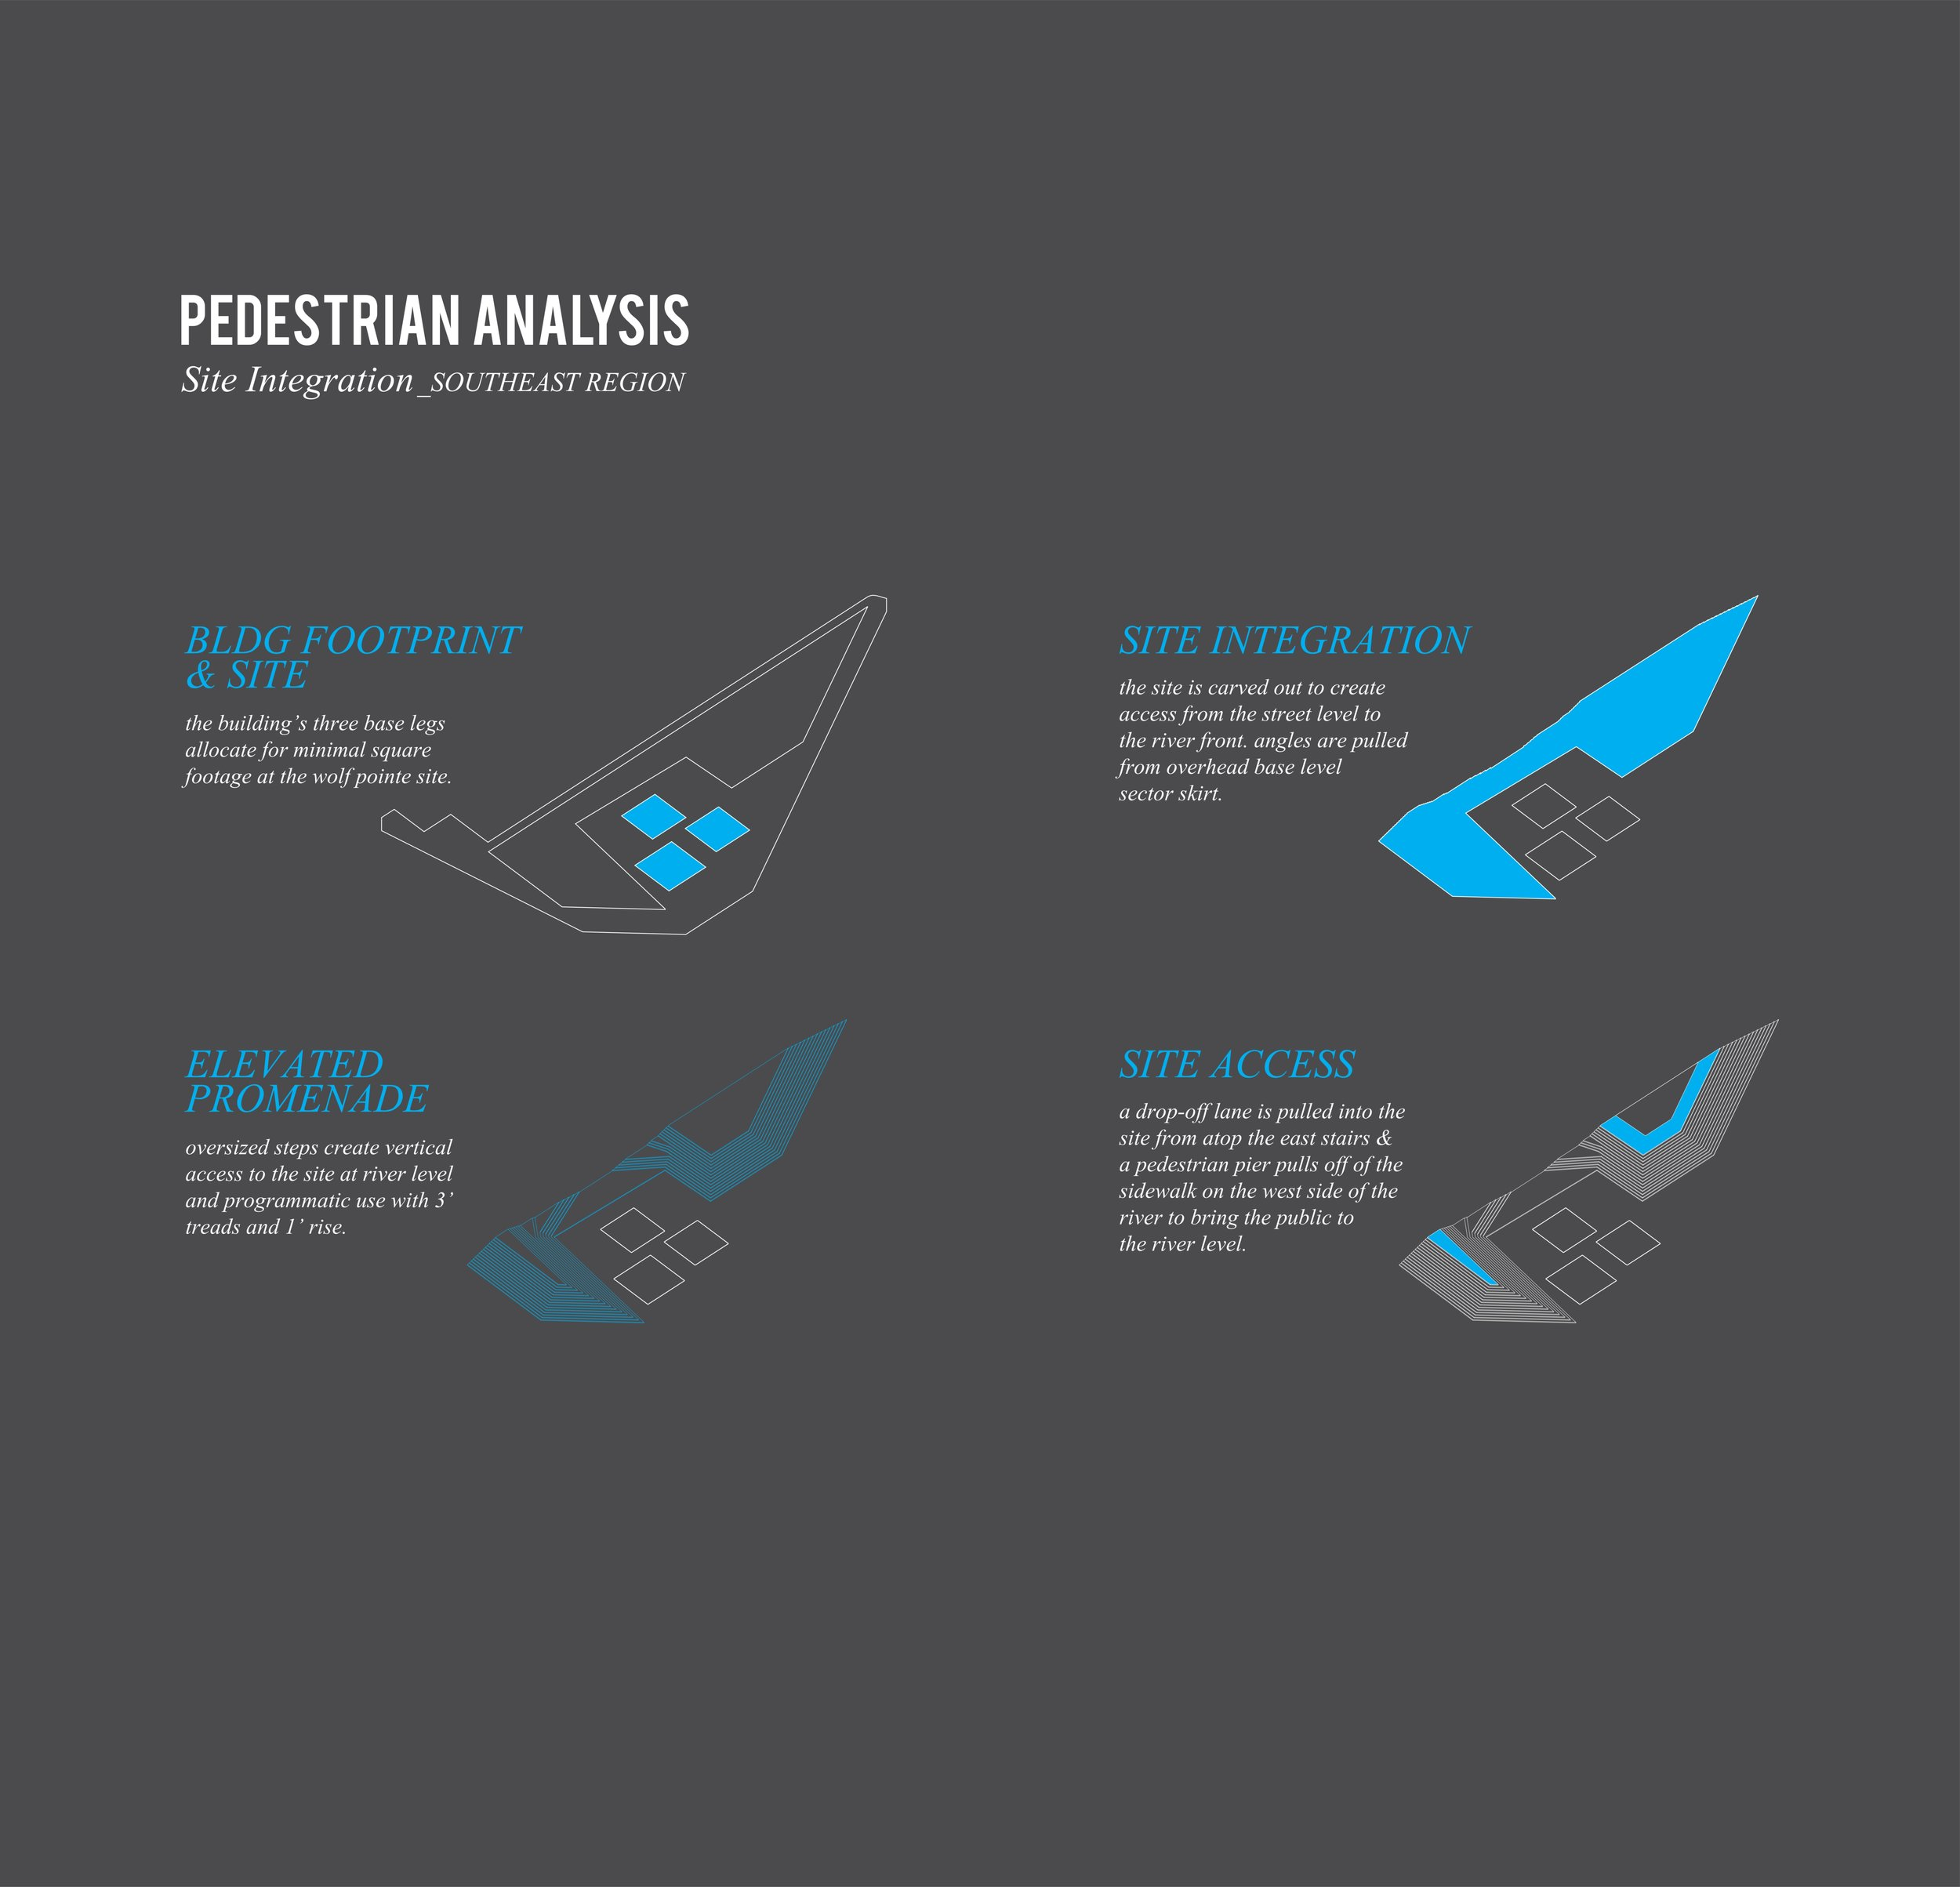 PEDESTRAIN ANALYSIS.jpg